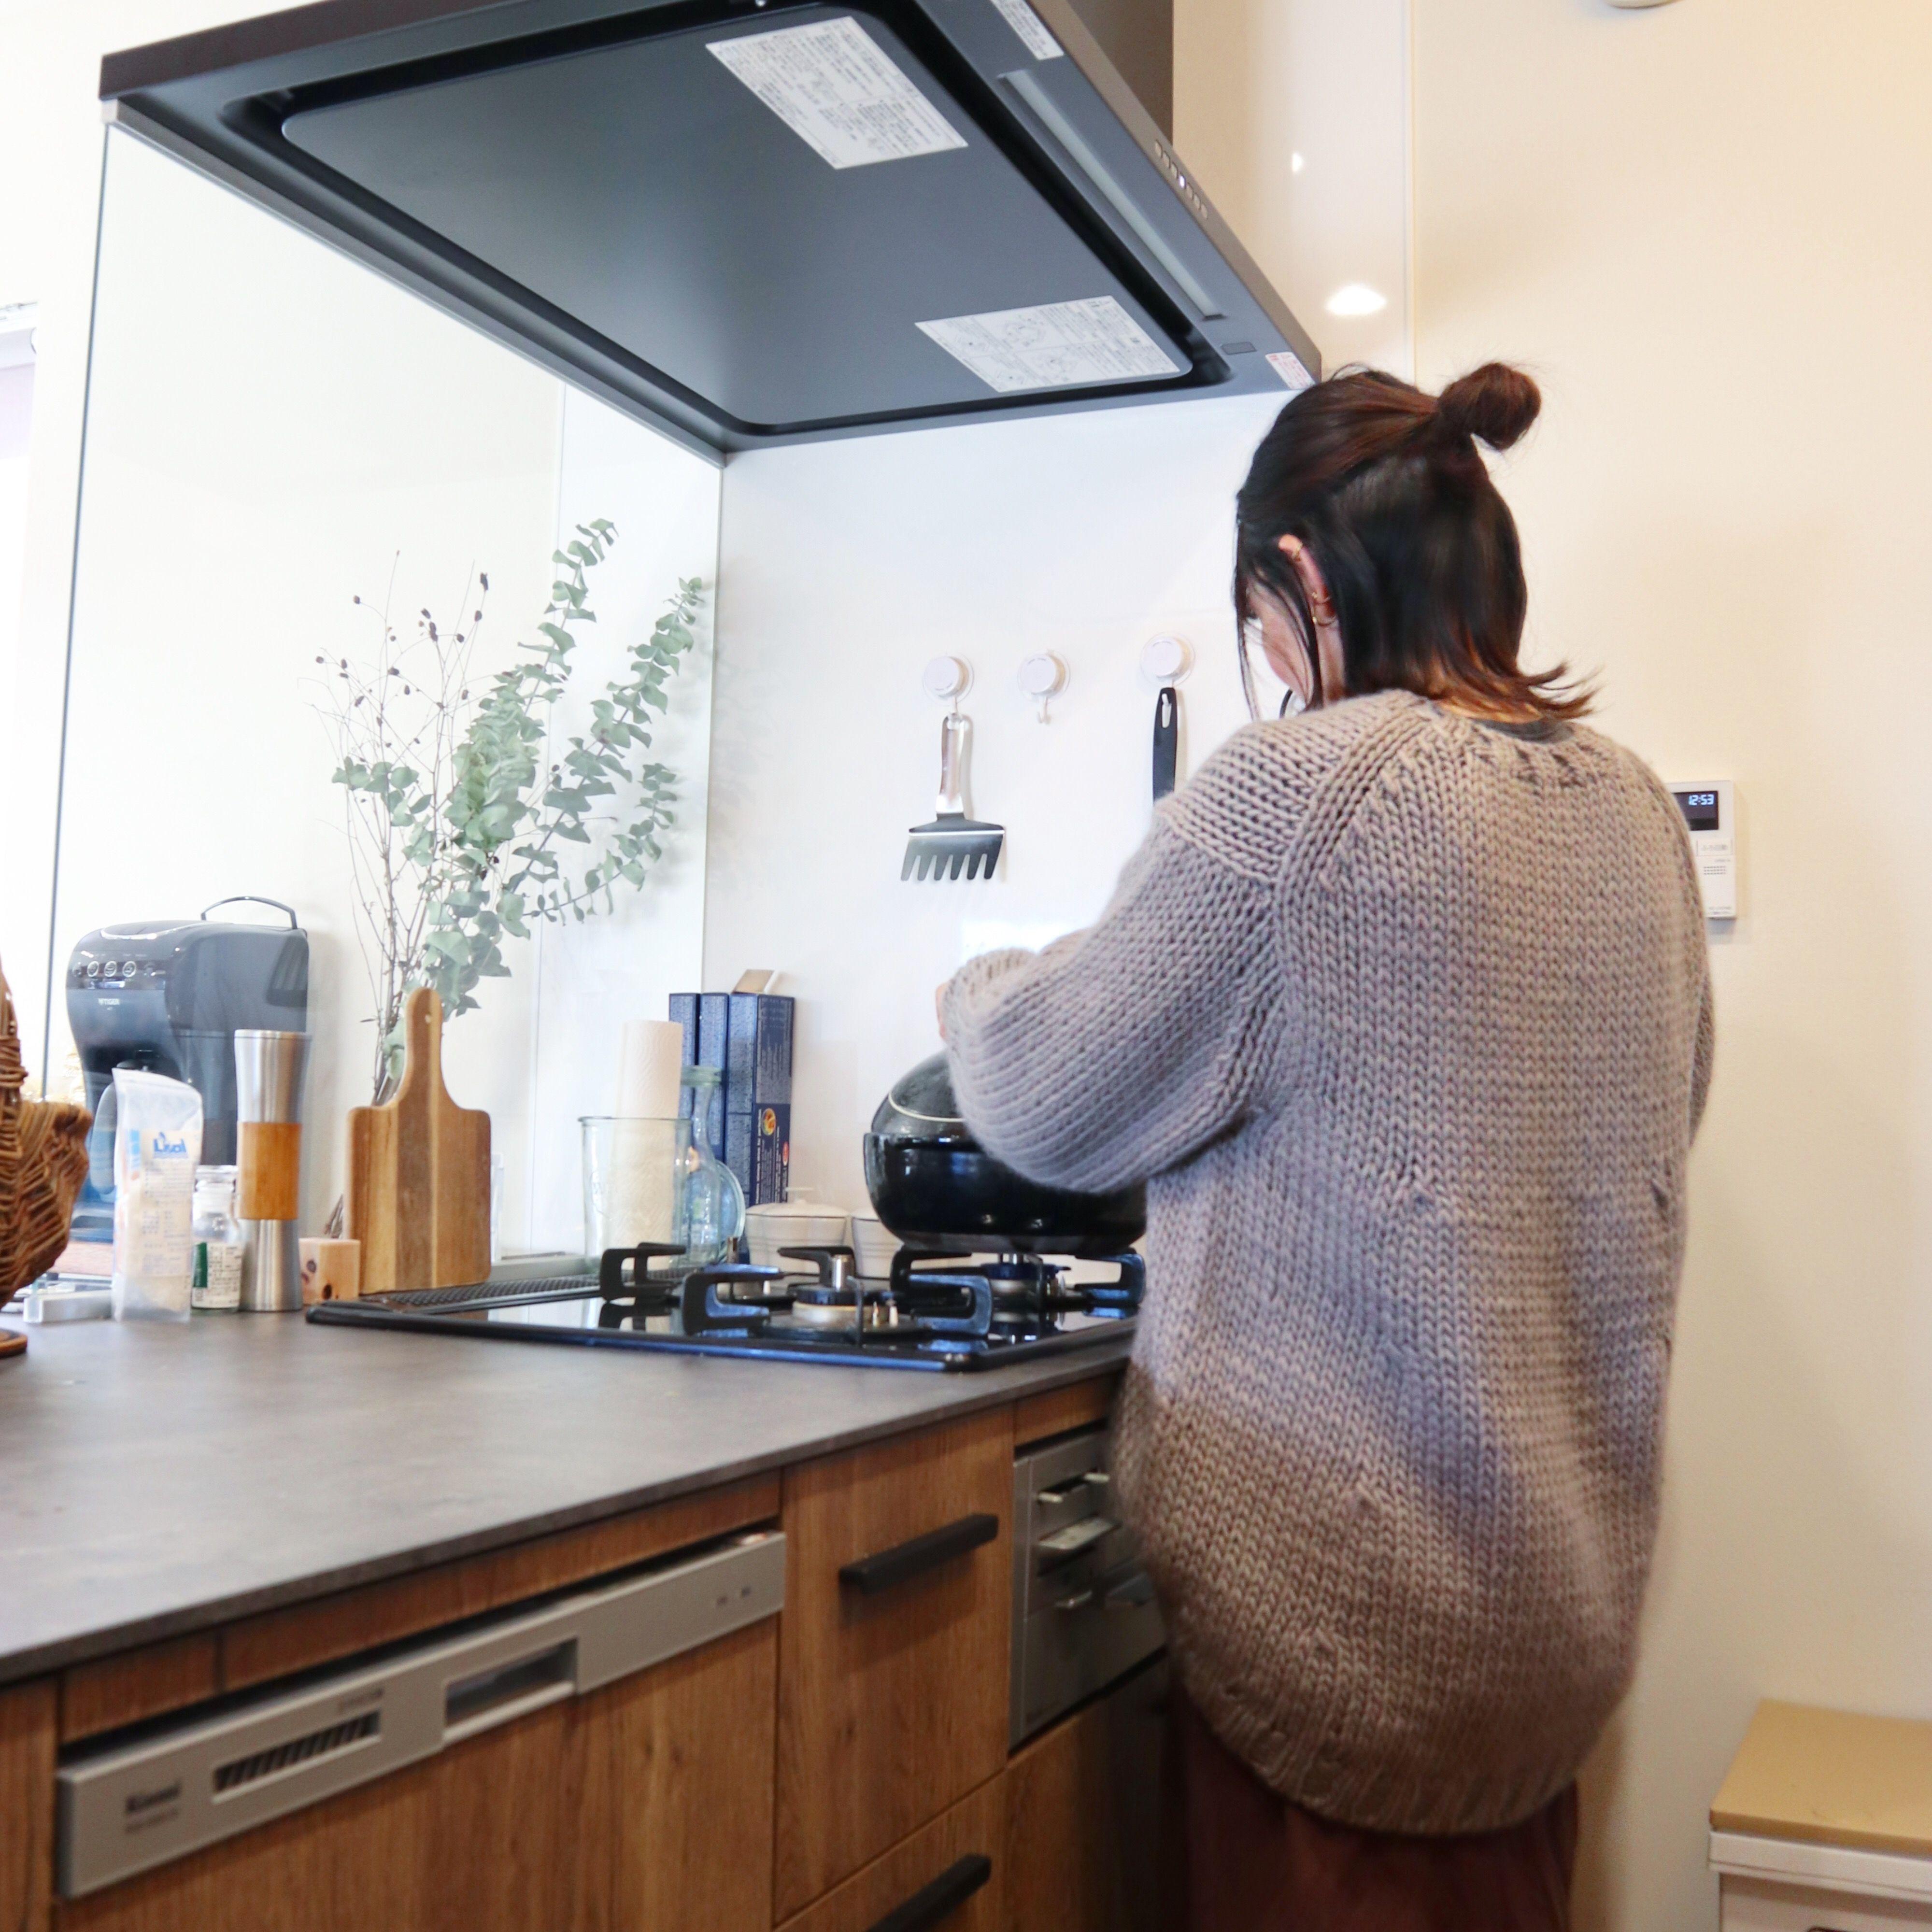 Kitchen キッチン おしゃれまとめの人気アイデア Pinterest Niim No Mori 健康 住宅 注文住宅 建築家